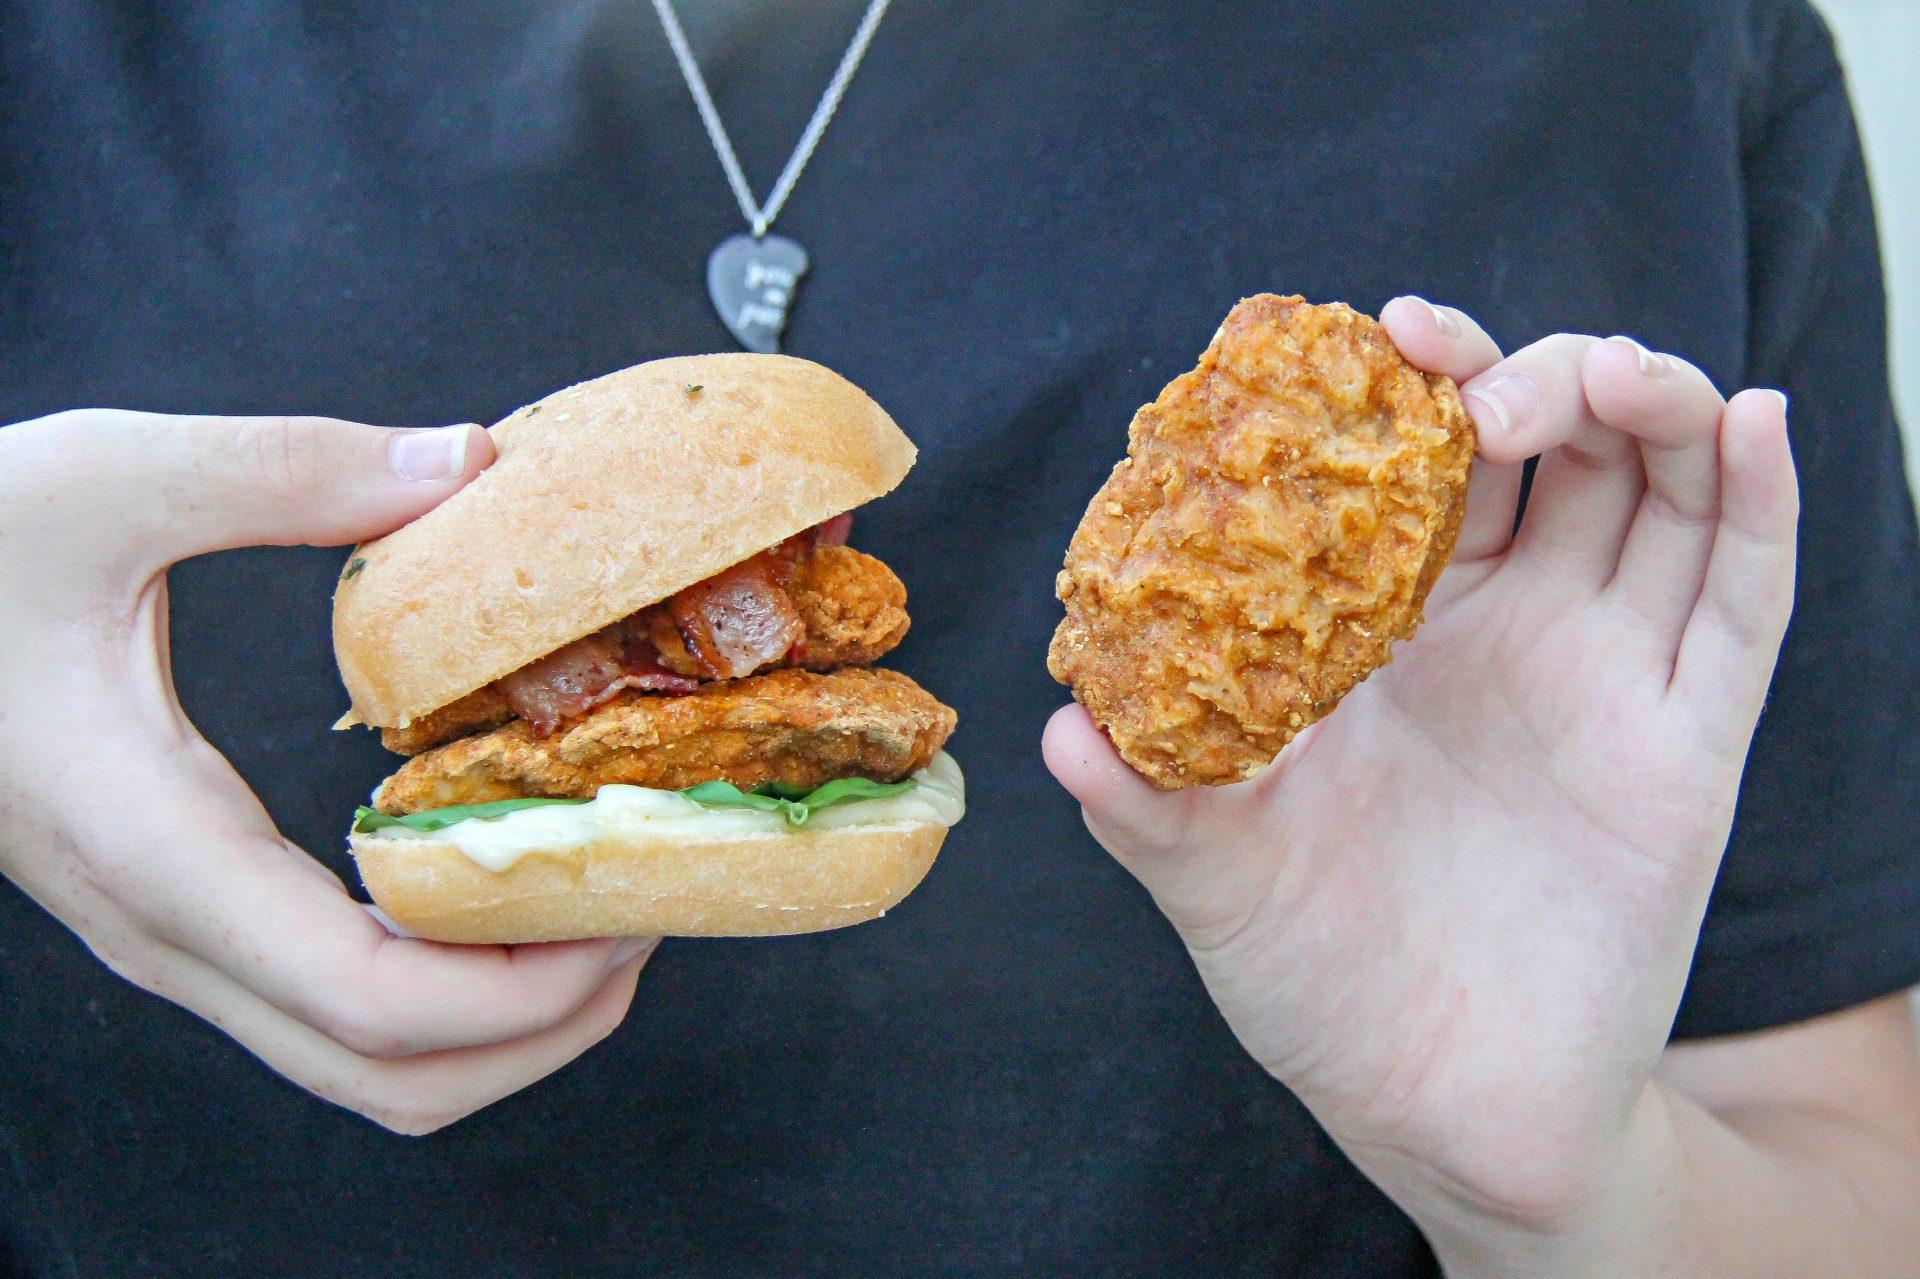 Gluten-free breaded chicken and bacon sandwiches using Caulipower chicken tenders.